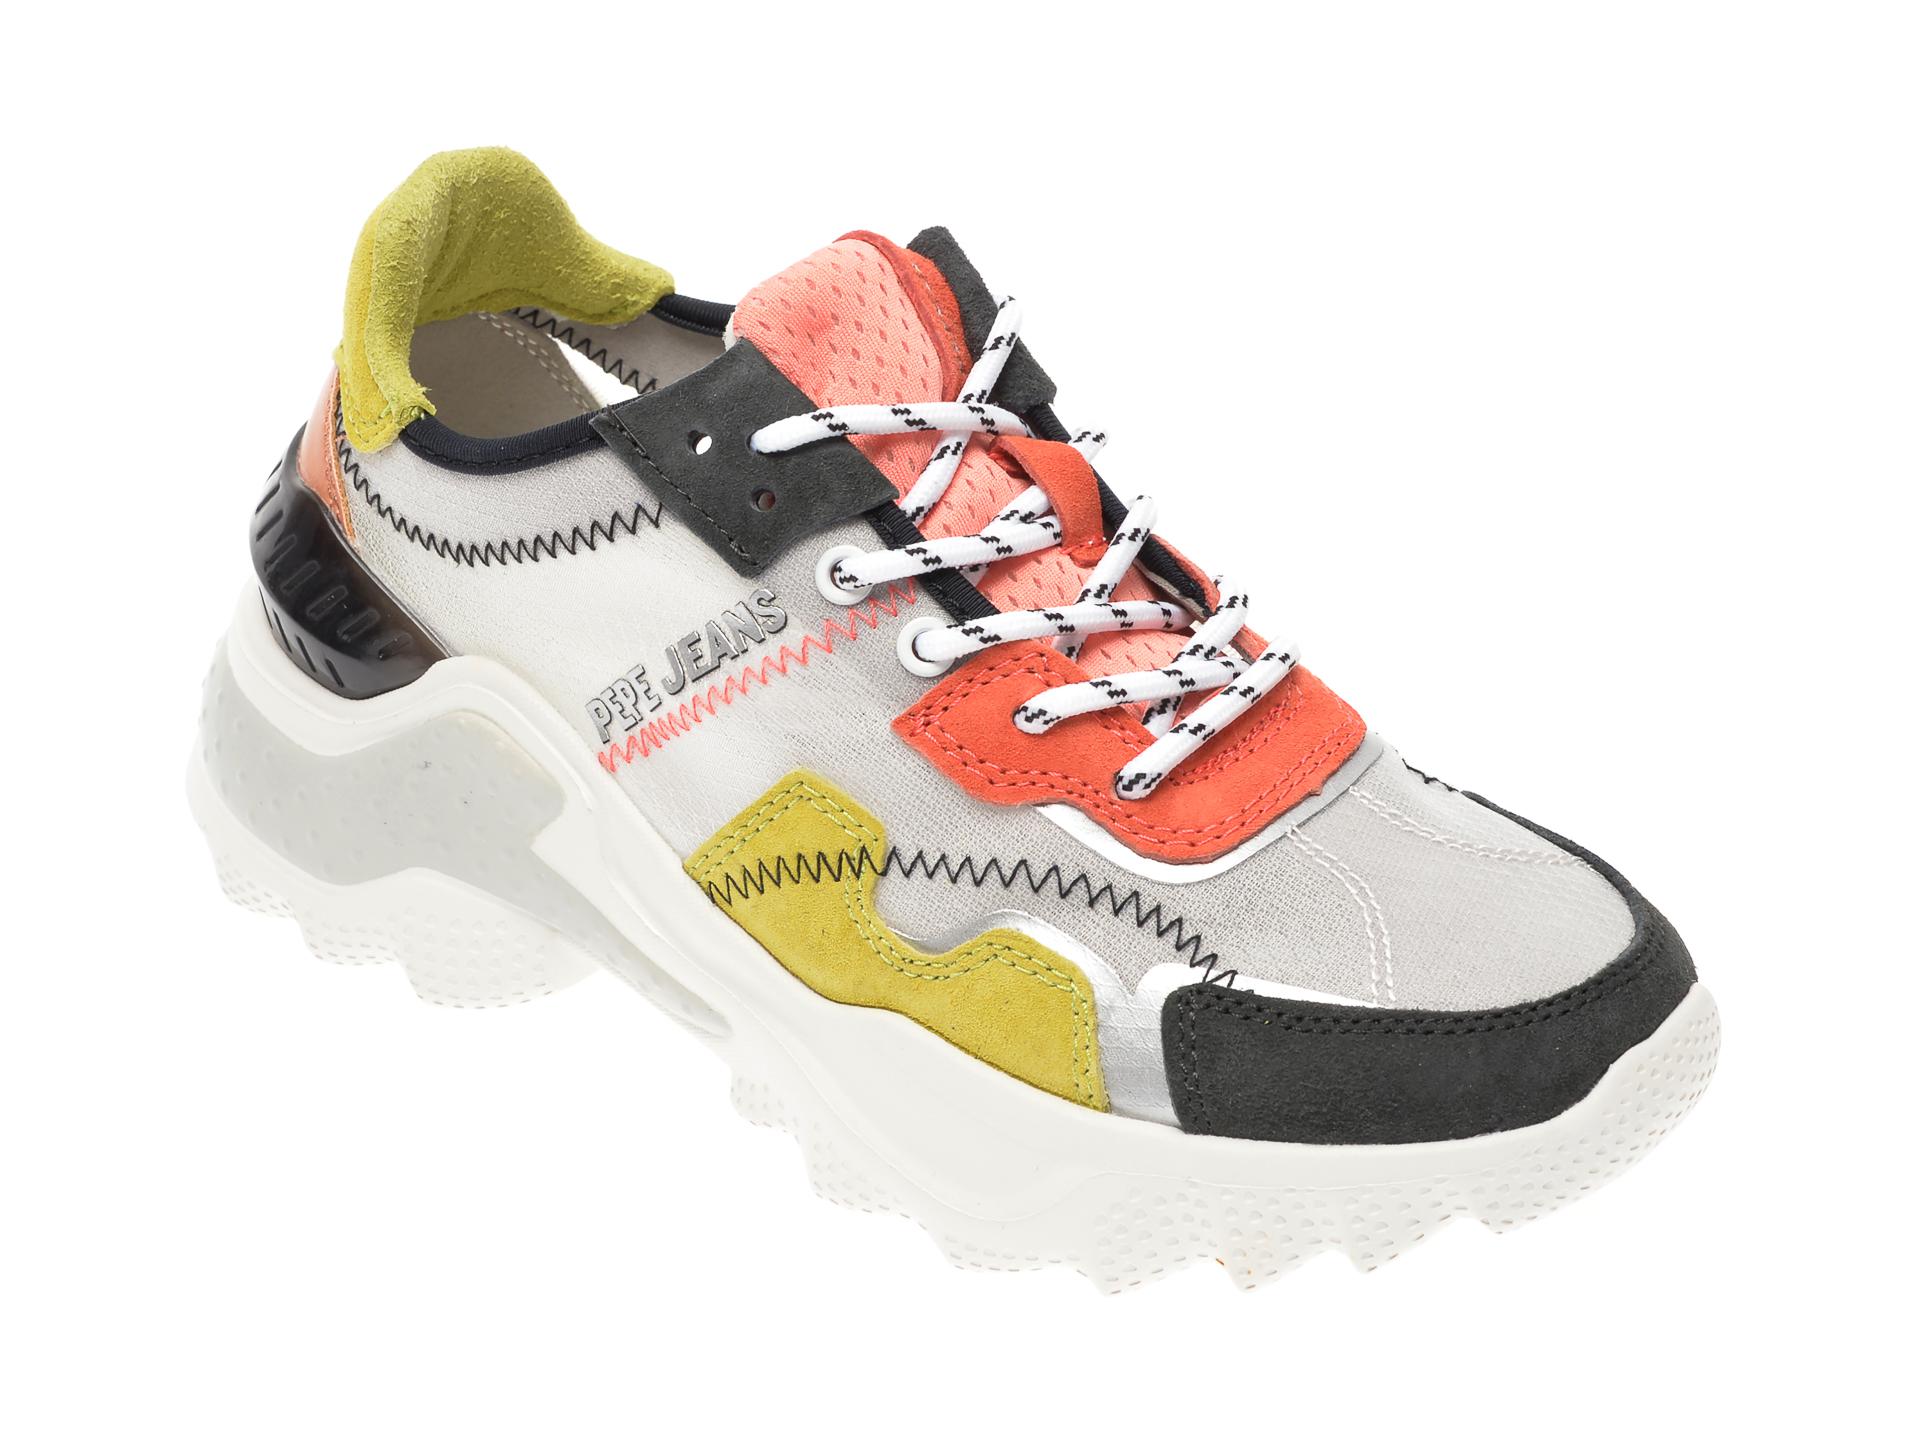 Pantofi sport PEPE JEANS multicolor, LS31003, din material textil si piele intoarsa